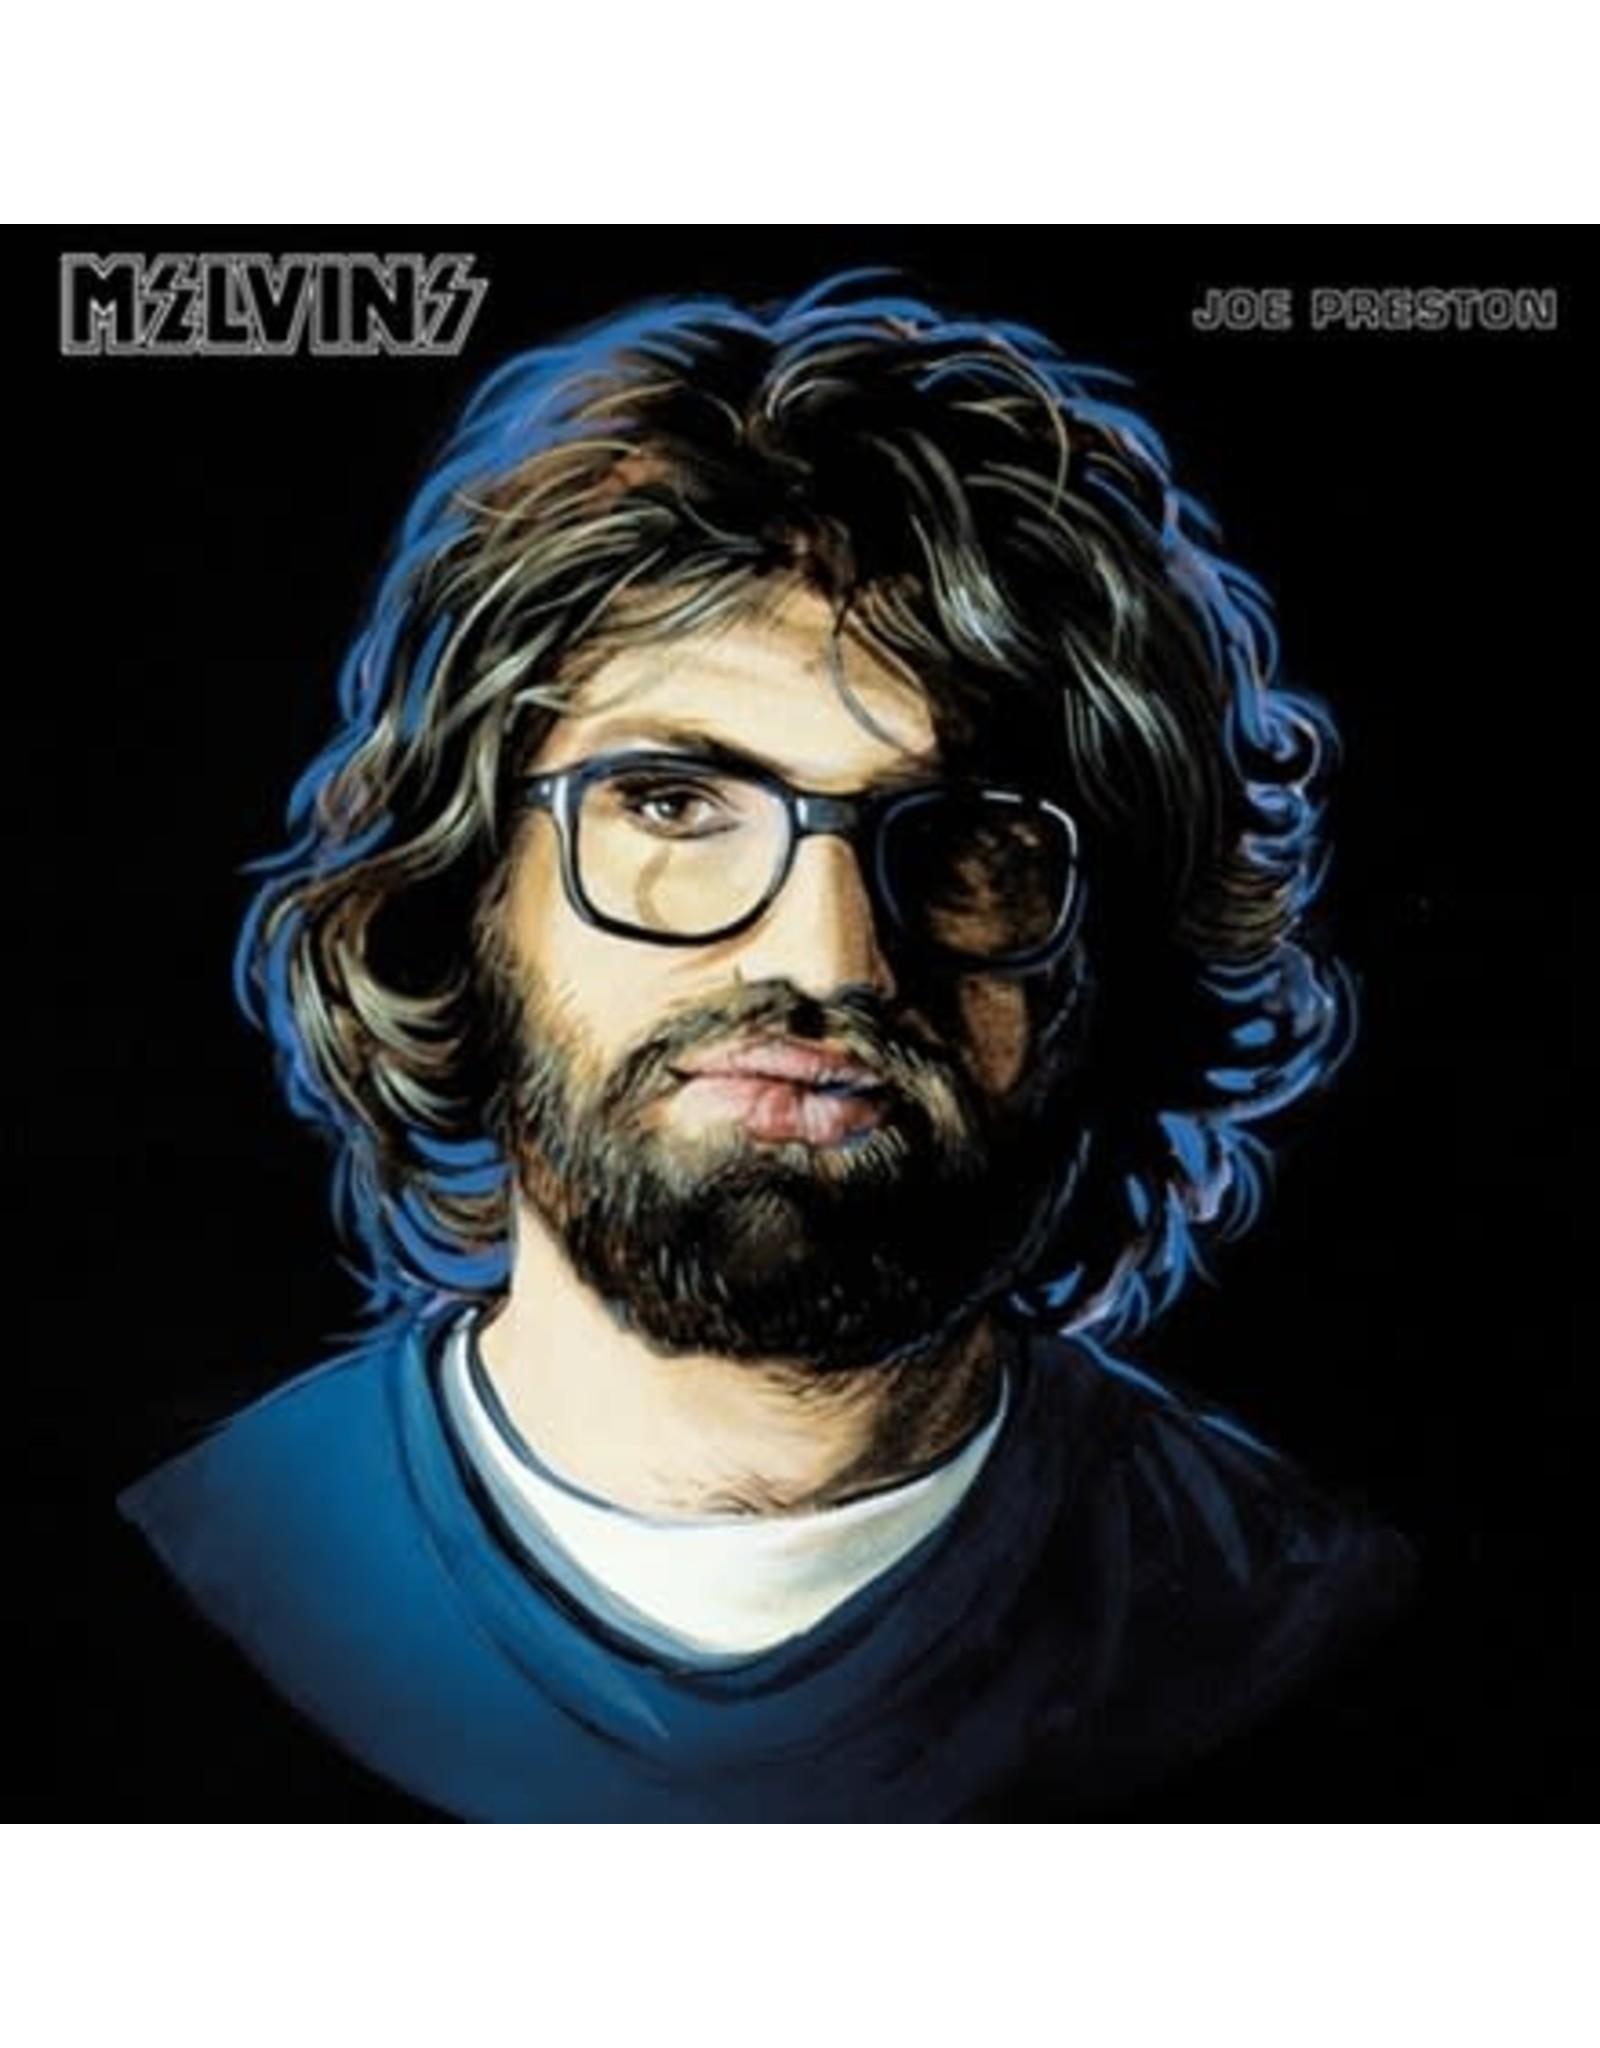 Boner Melvins: Joe Preston LP